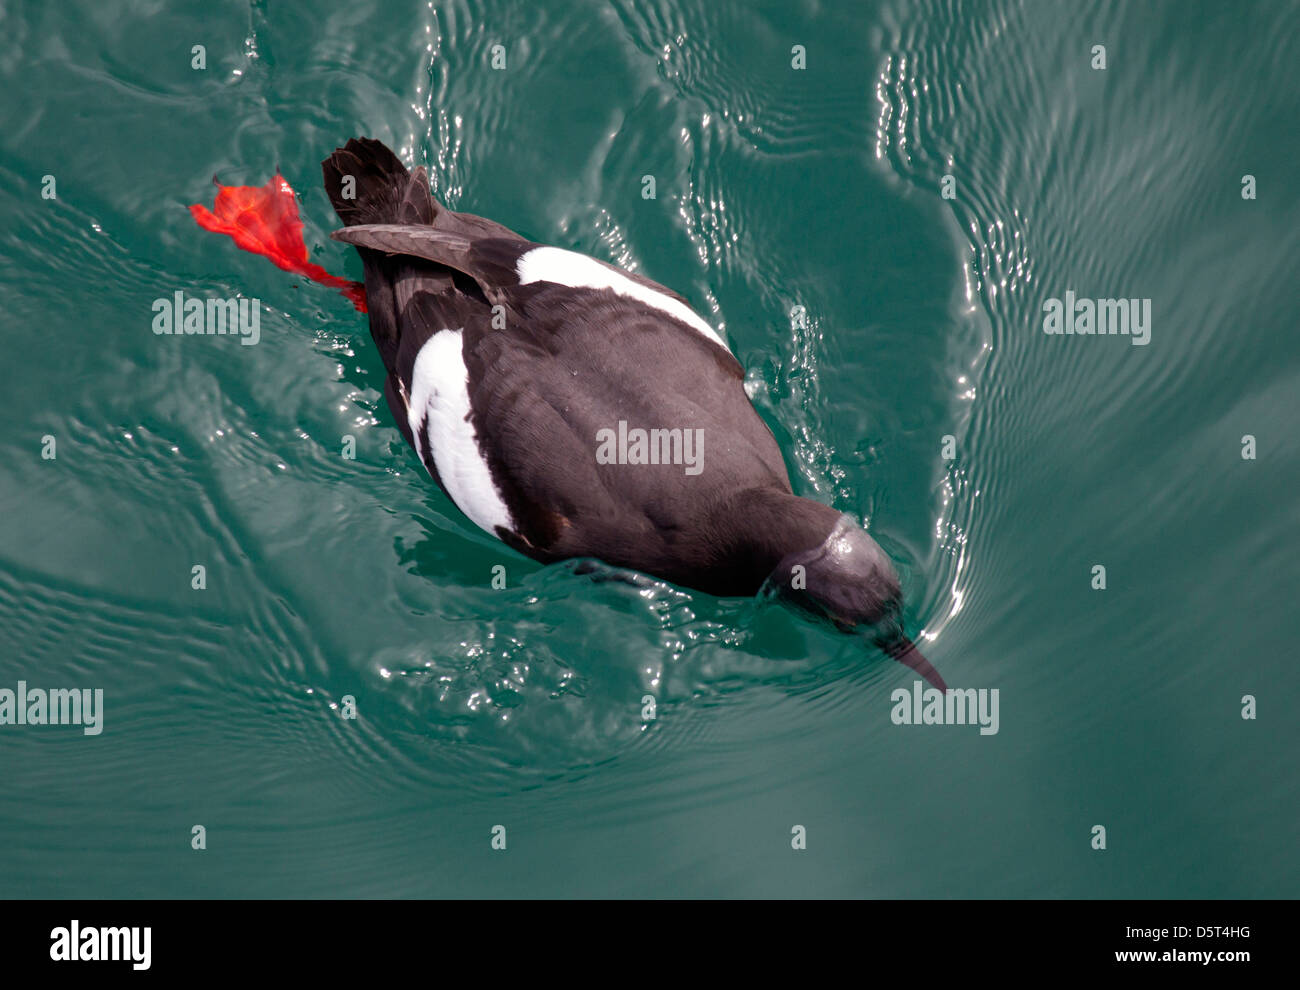 Pigeon Guillemot Peering Underwater - Stock Image